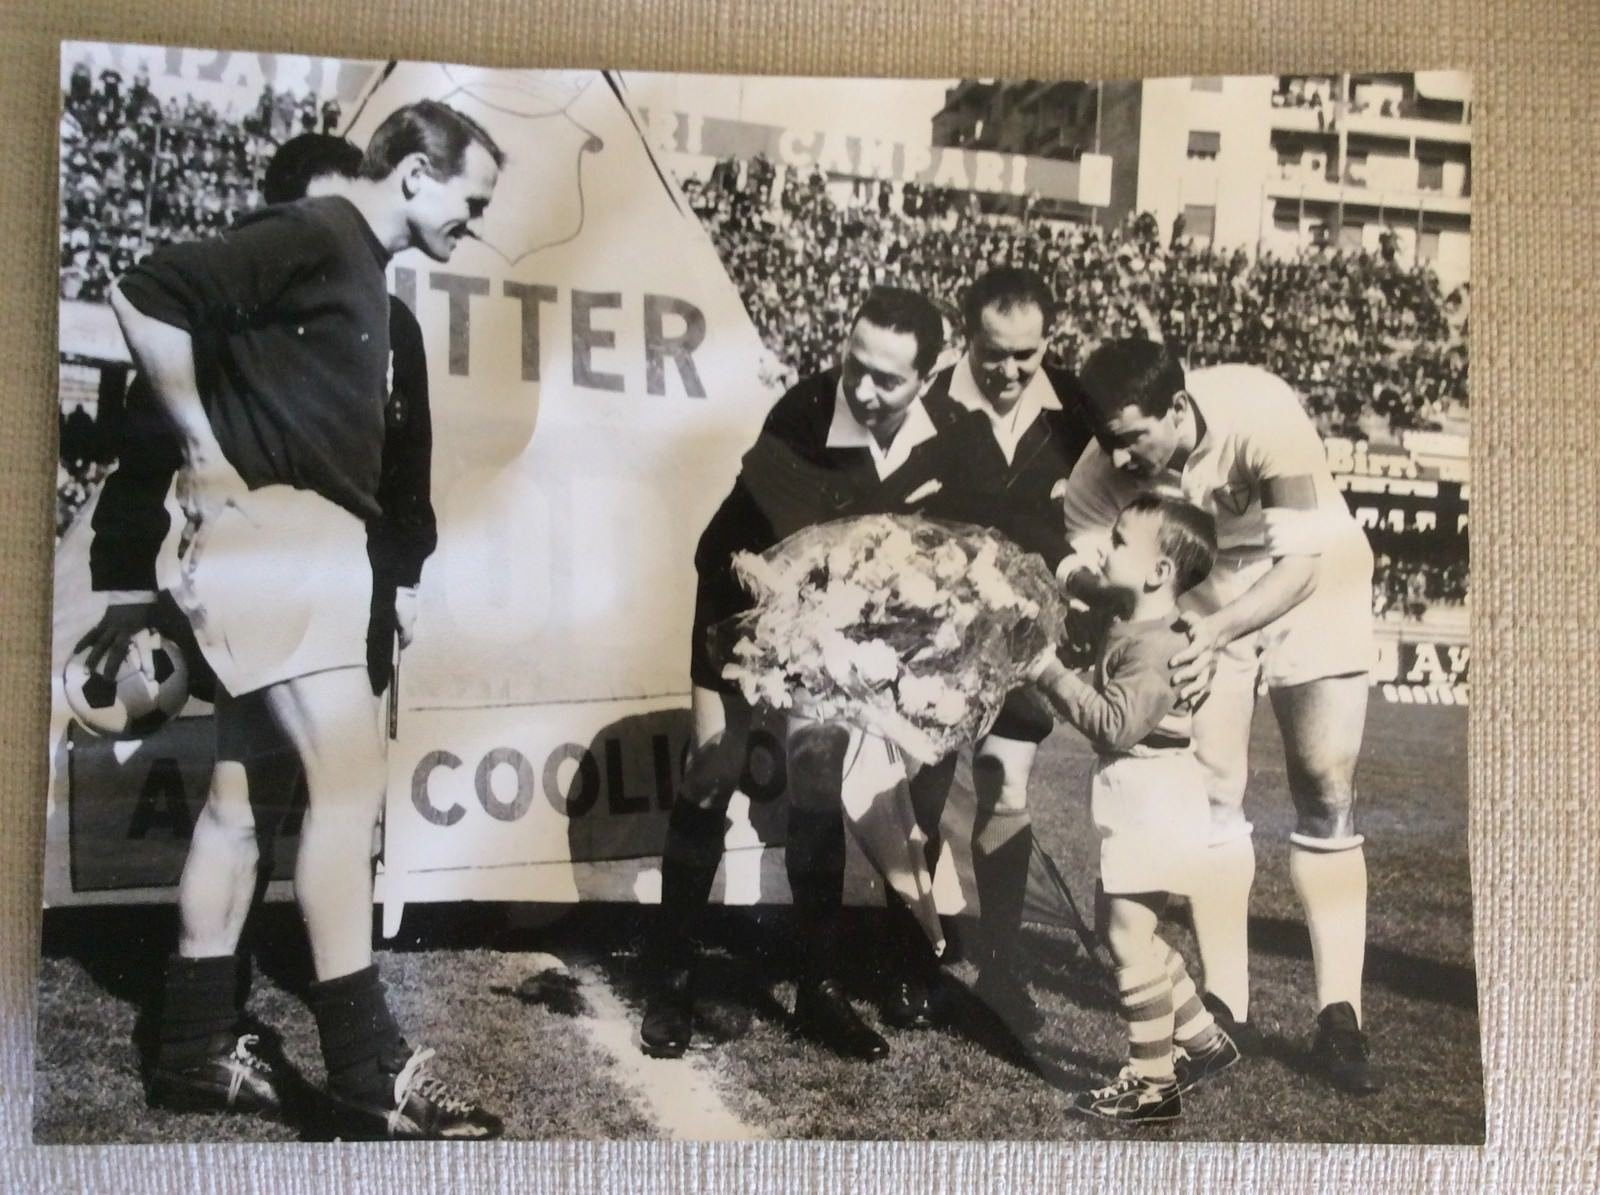 1966-PARTITA-SAMPDORIA-FIORENTINA-CAPITANI-HAMRIN-VINCENZI b.jpg